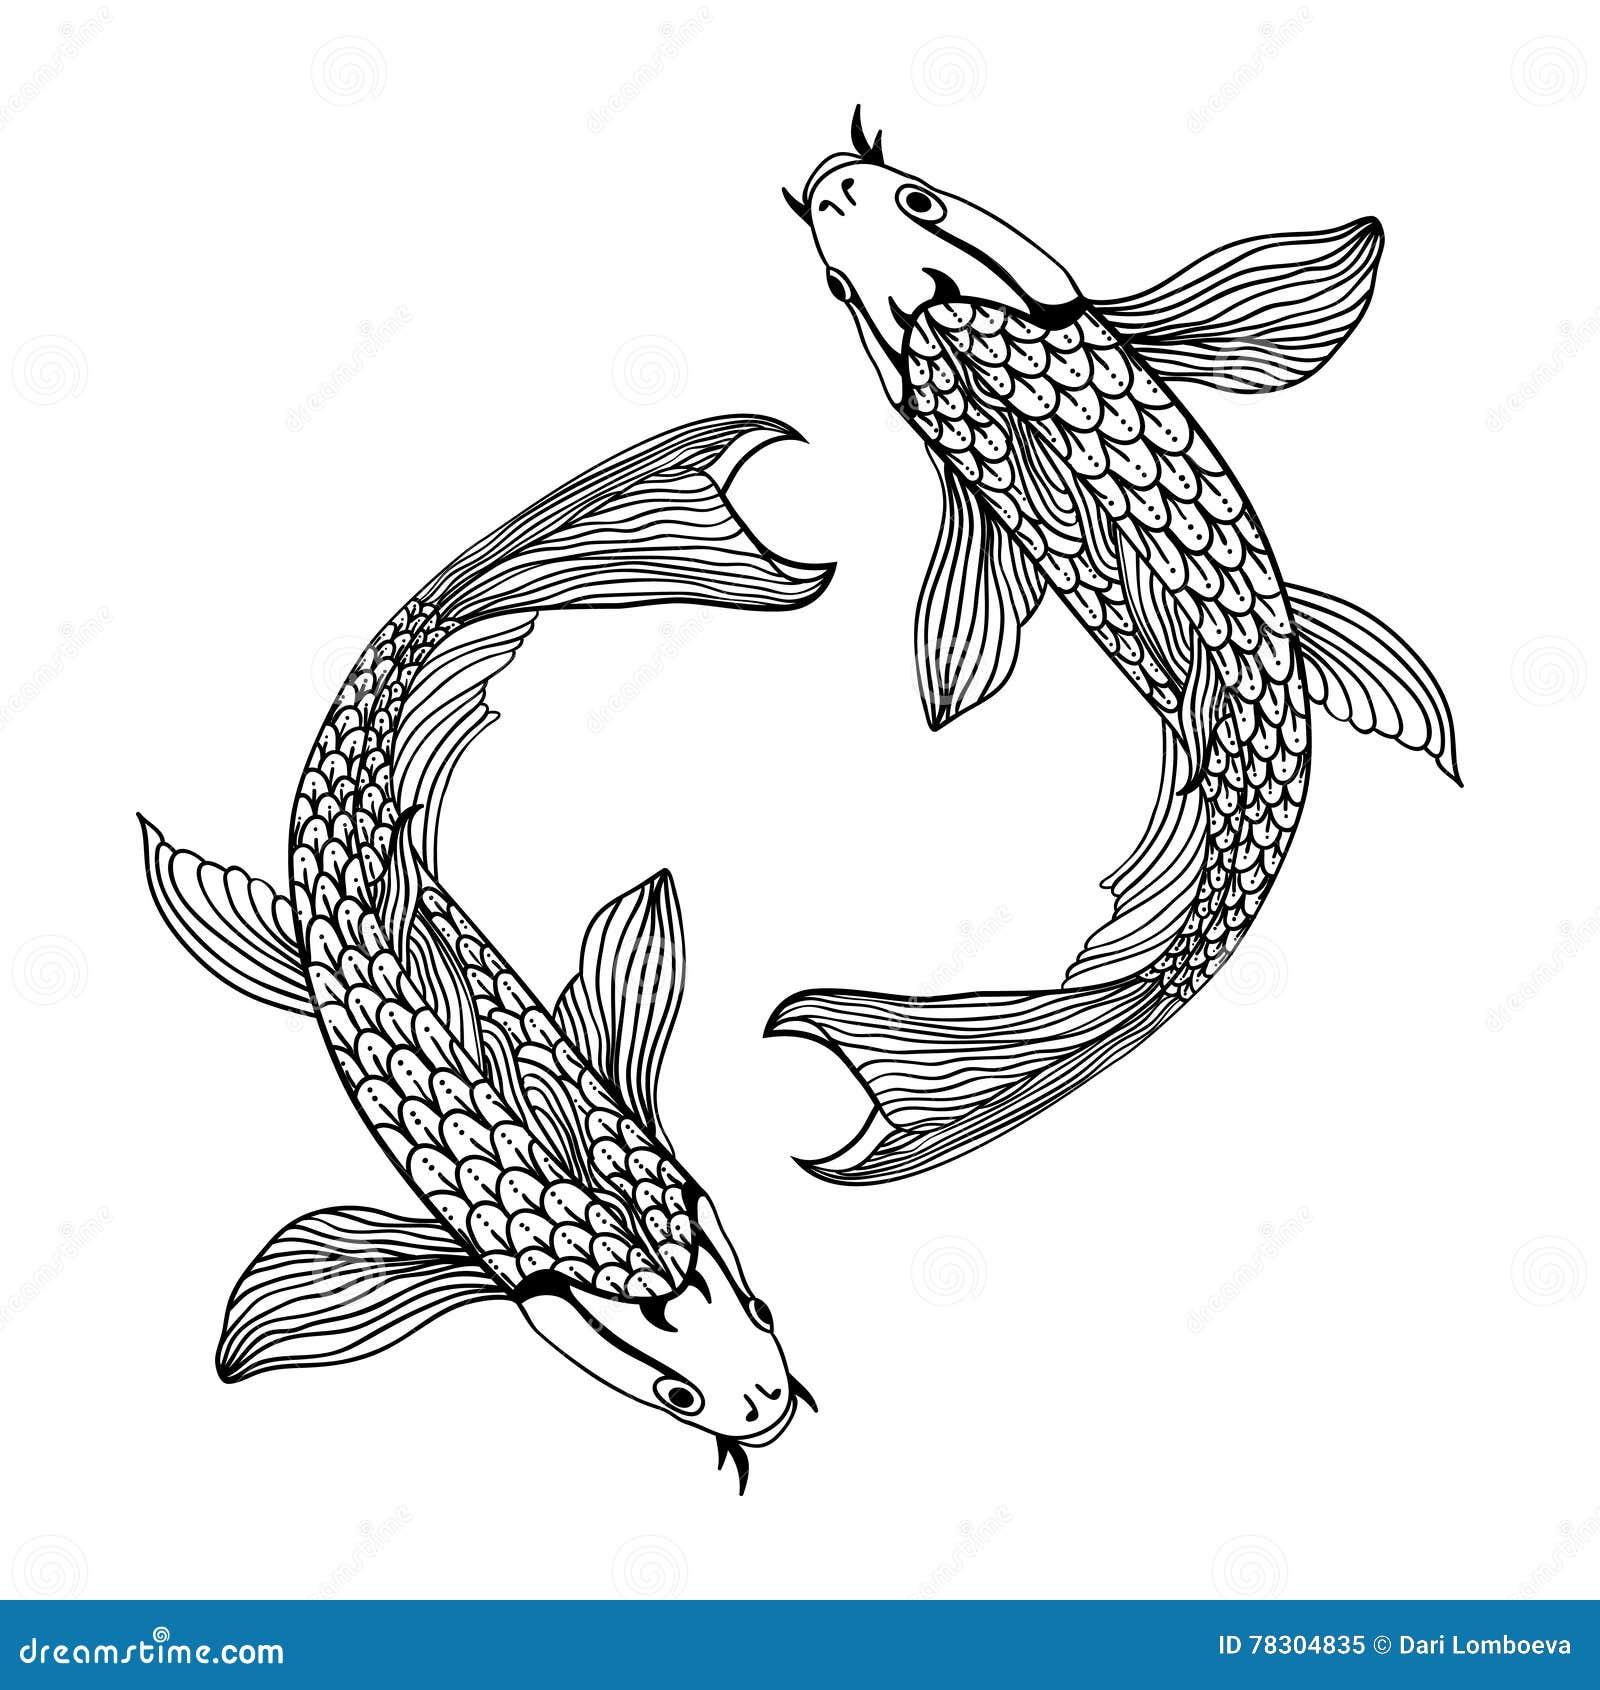 Chinese symbol of friendship stock illustration illustration of beautiful koi carp fish illustration in monochrome symbol of love friendship and prosperity royalty biocorpaavc